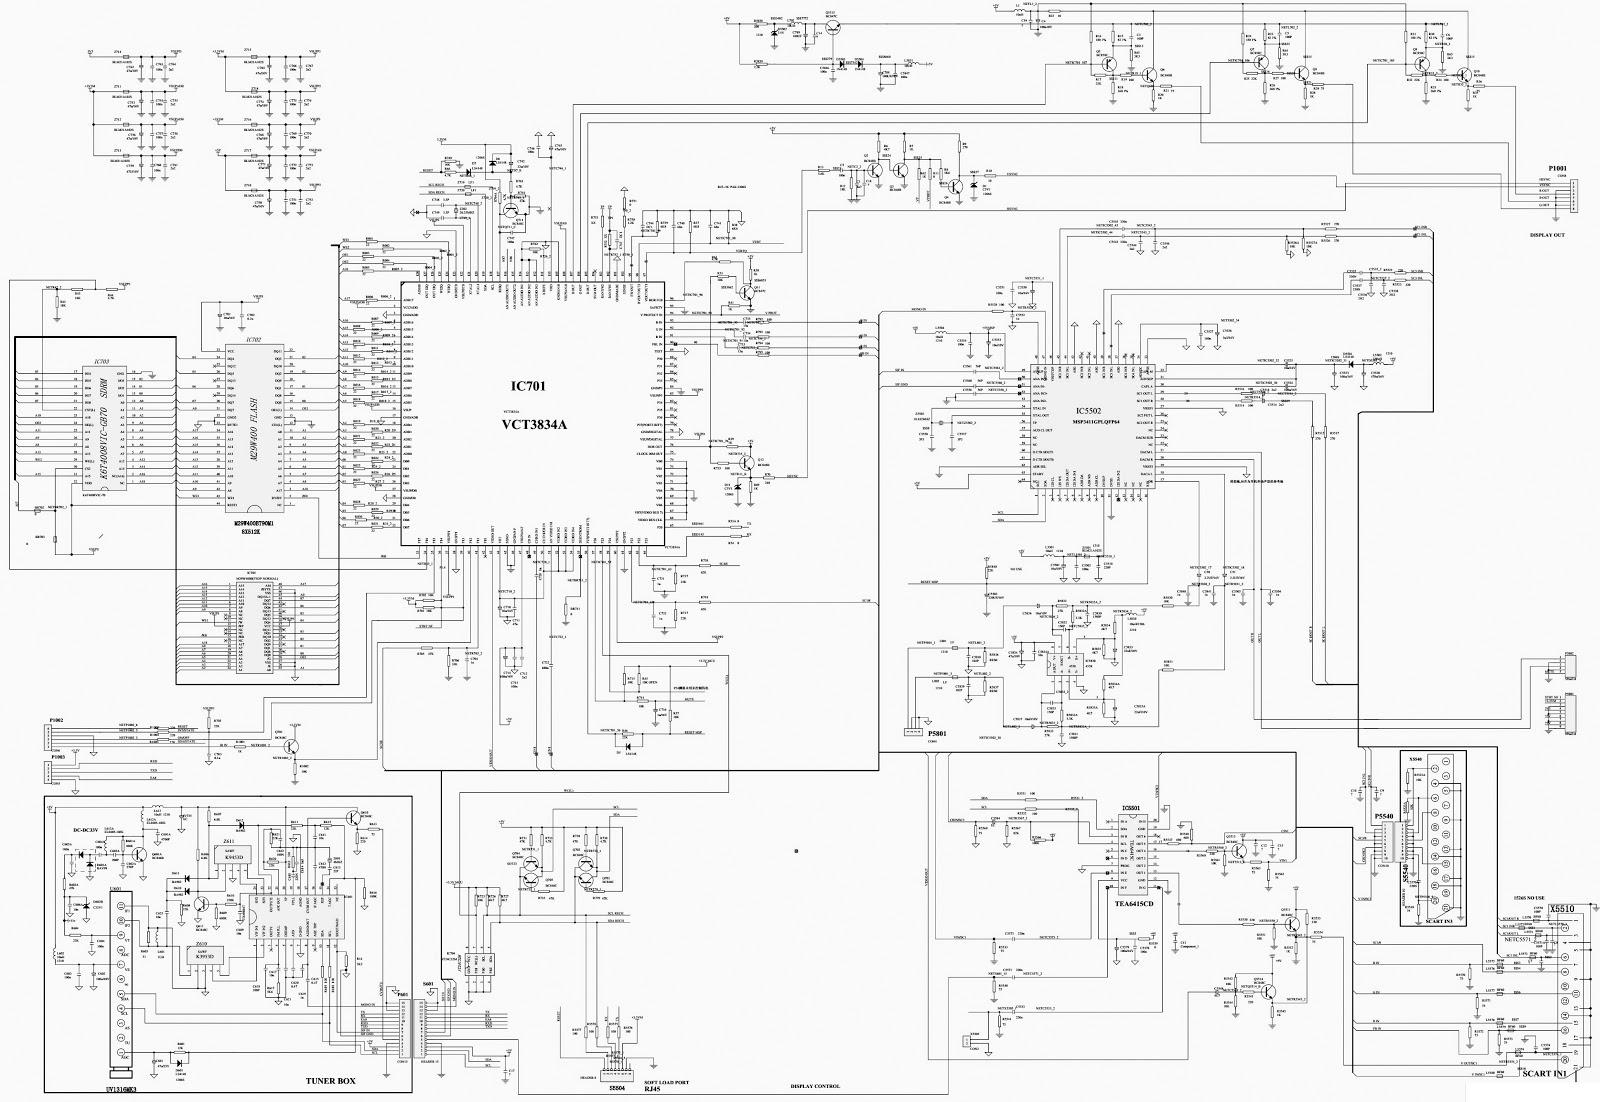 hight resolution of hobart am14 wiring diagram lincoln sa 250 welder wiring diagram hobart wiring diagram 13